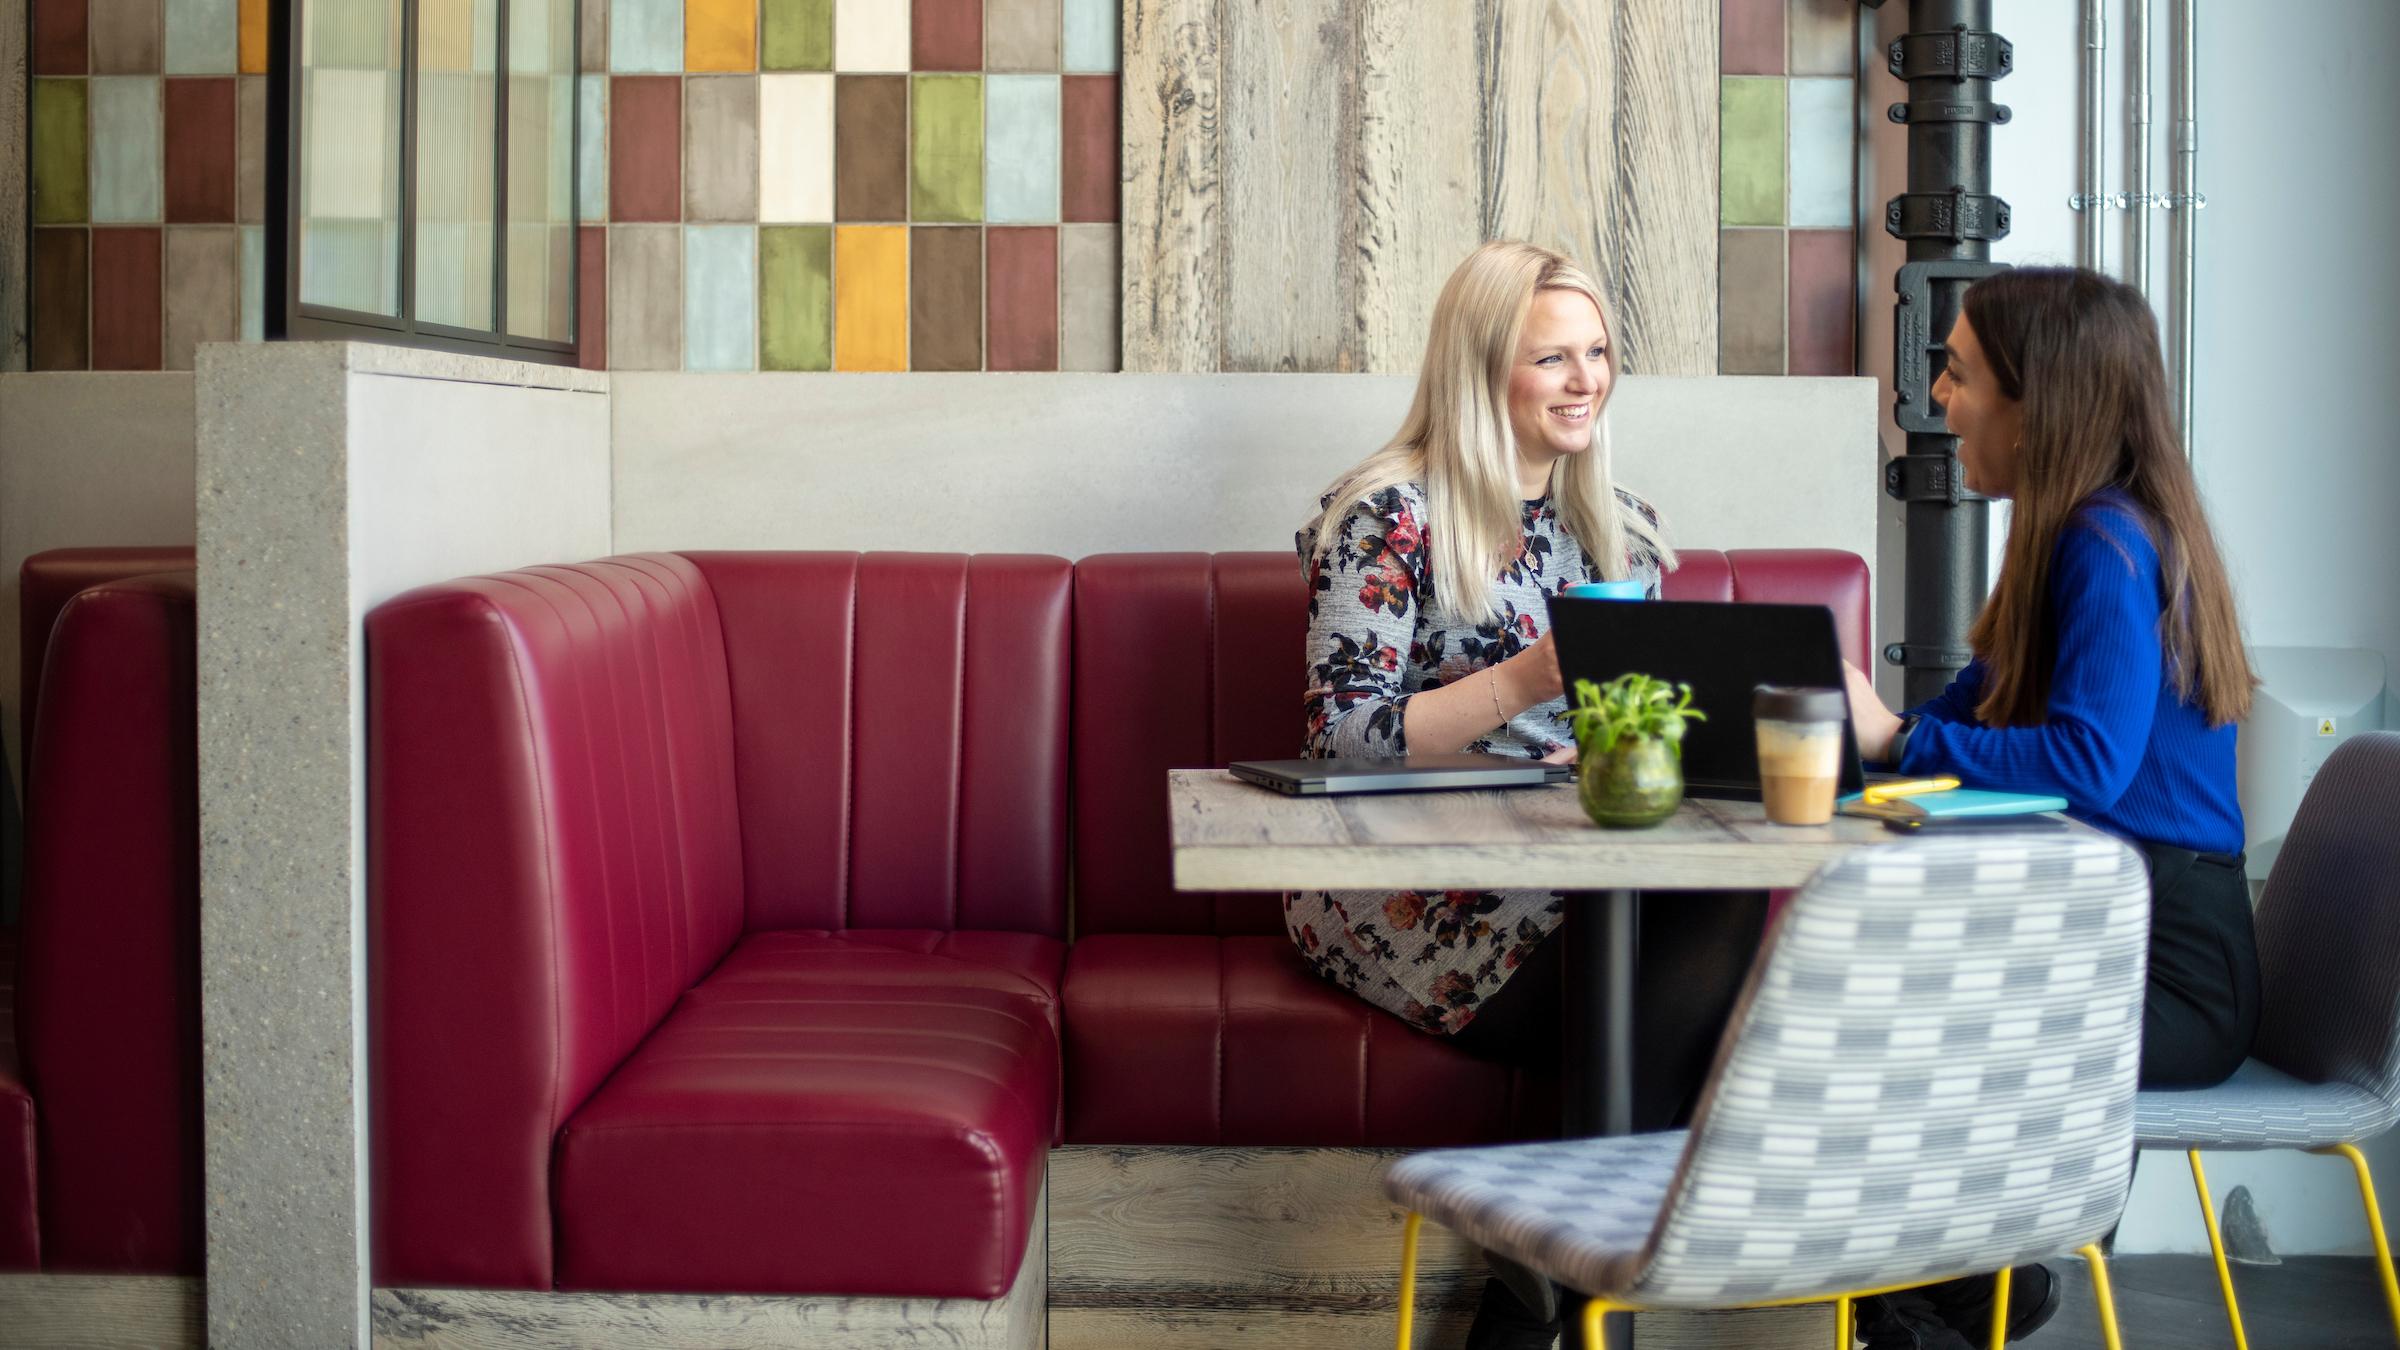 Two women in an informal meeting in a breakout area in a modern office environment